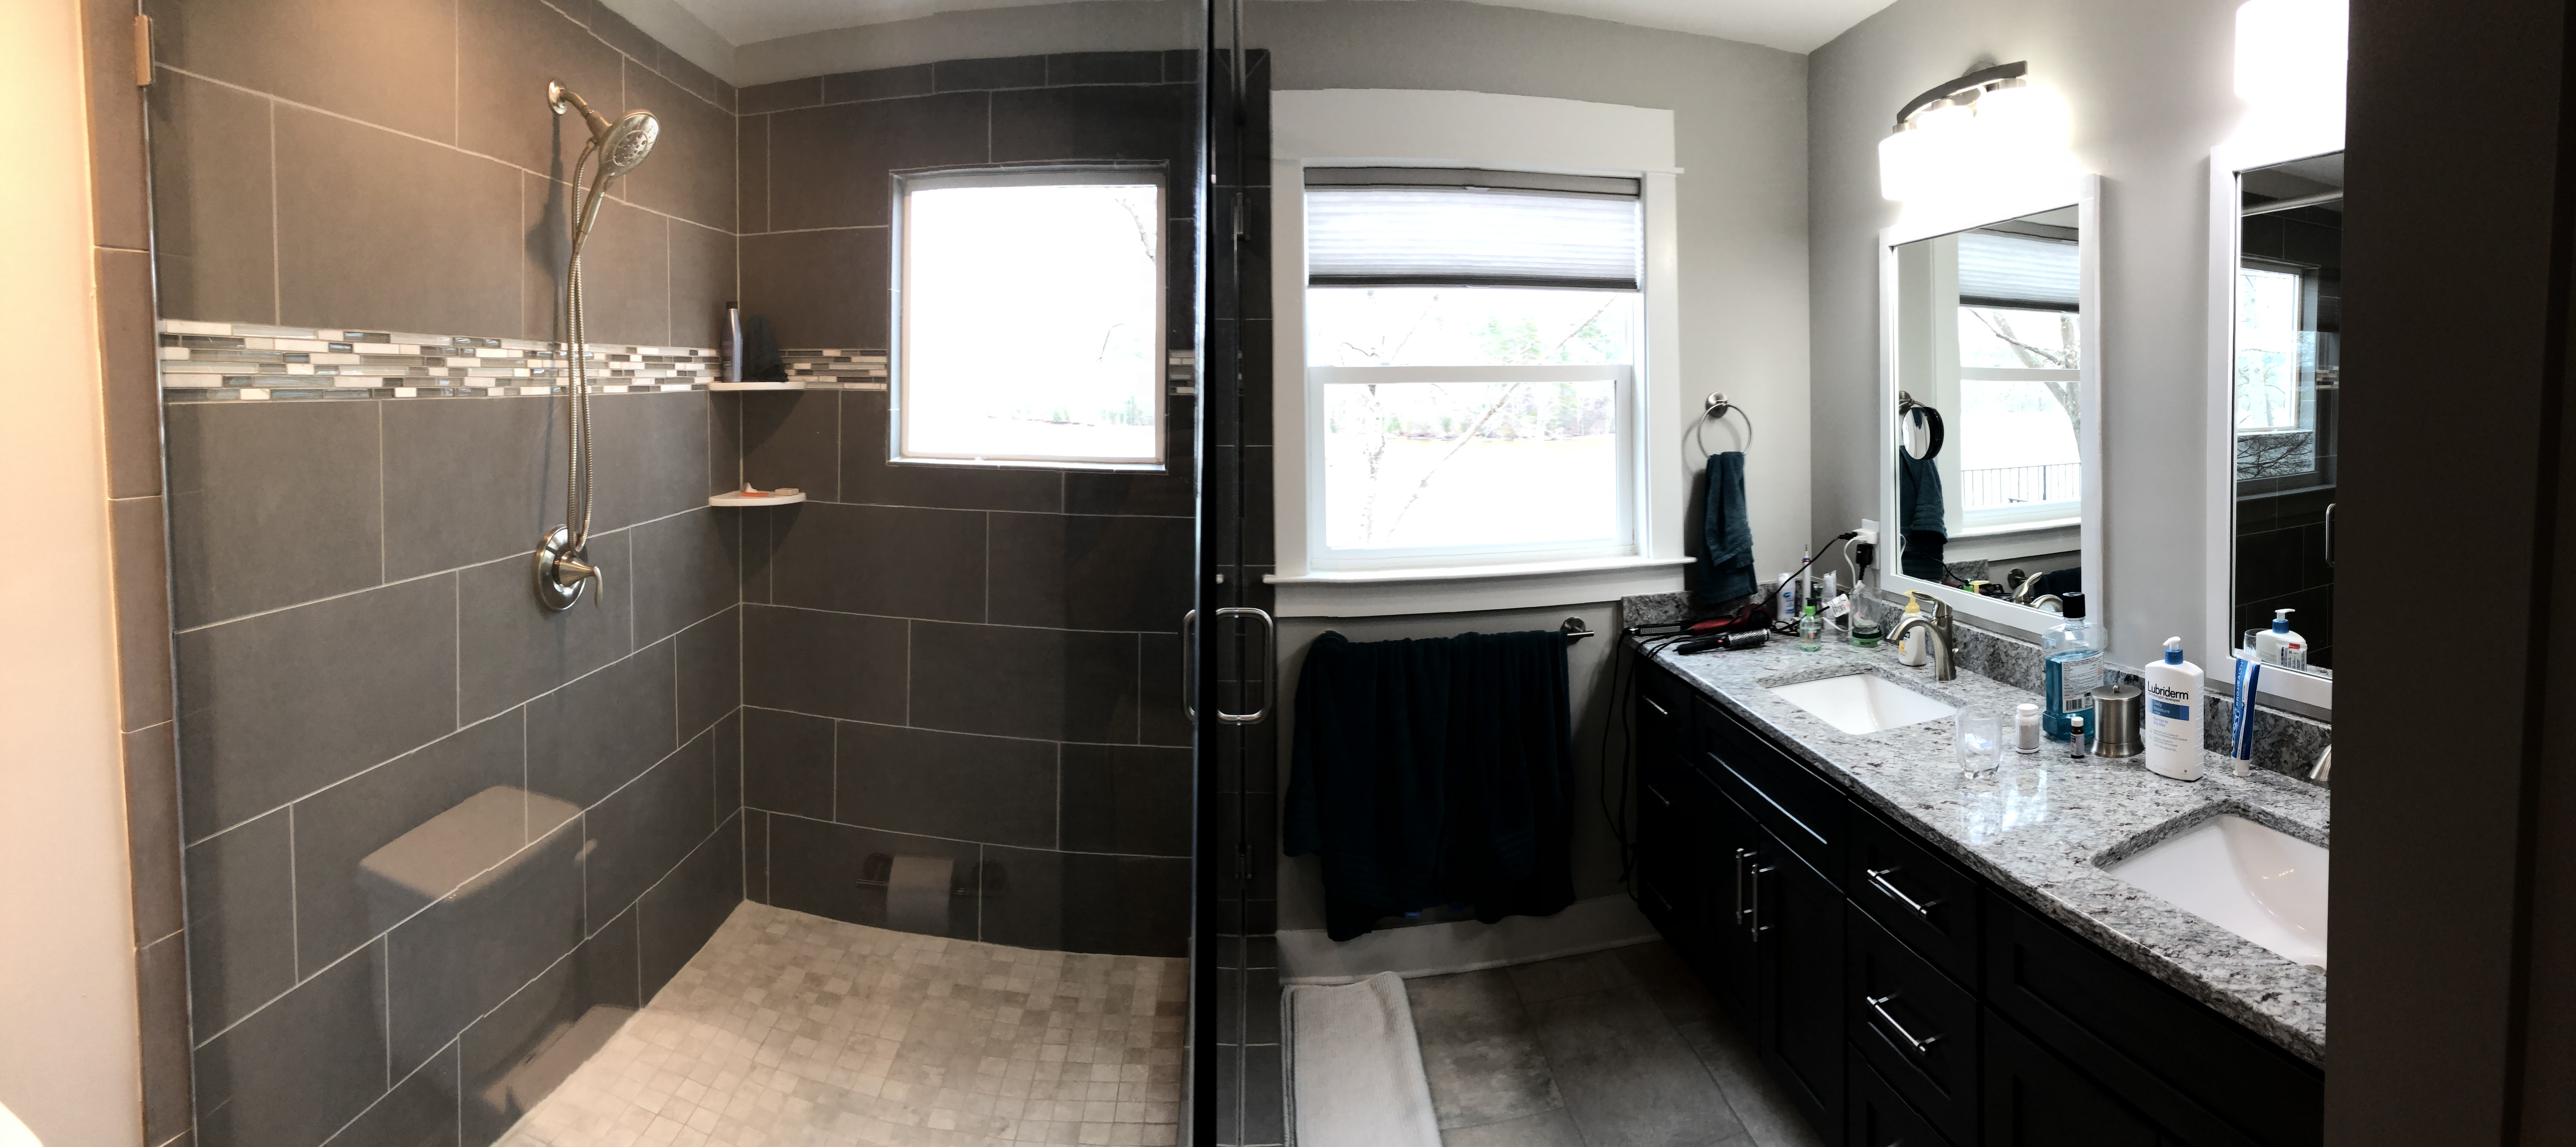 the new master bath